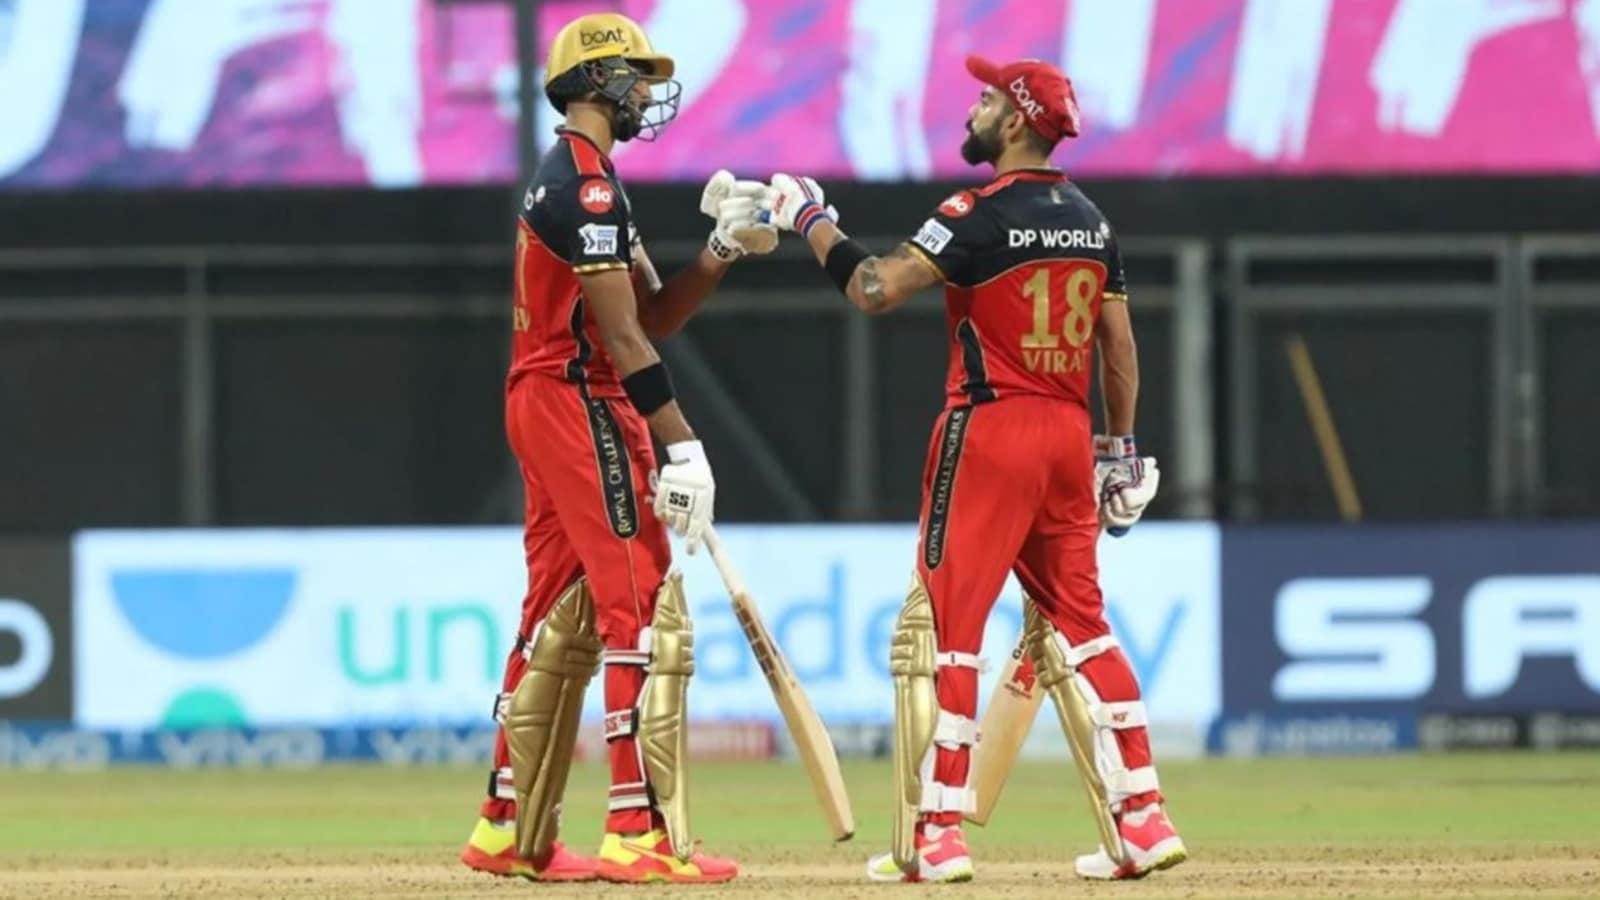 RCB vs RR, IPL 2021 highlights: Padikkal century, Kohli fifty guide RCB to a 10-wicket win | Hindustan Times